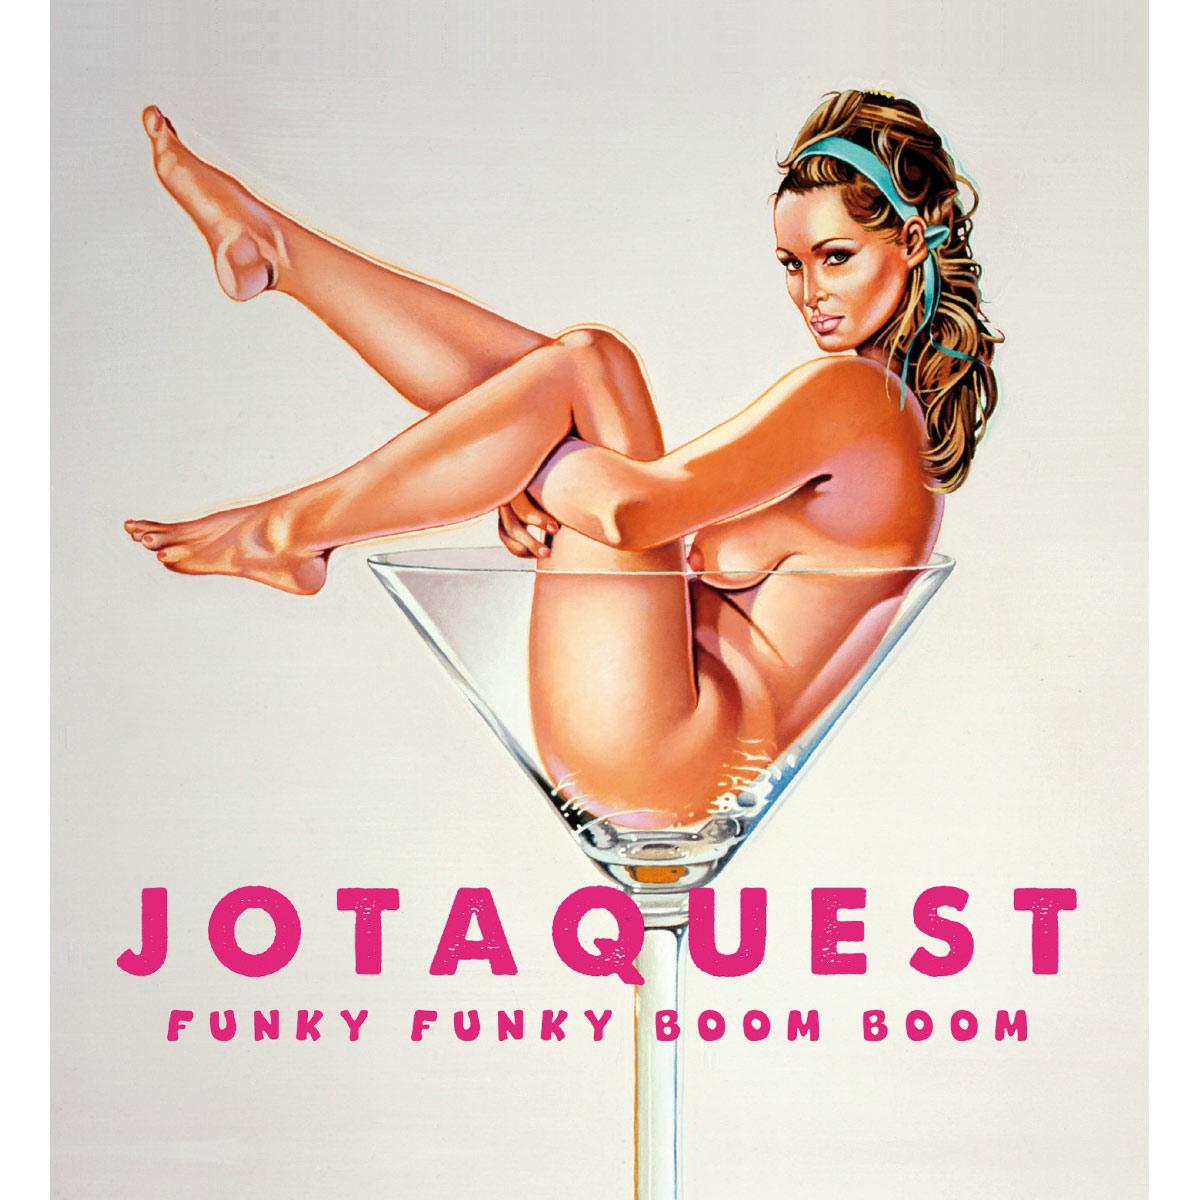 LP Duplo Jota Quest Funky Funky Boom Boom